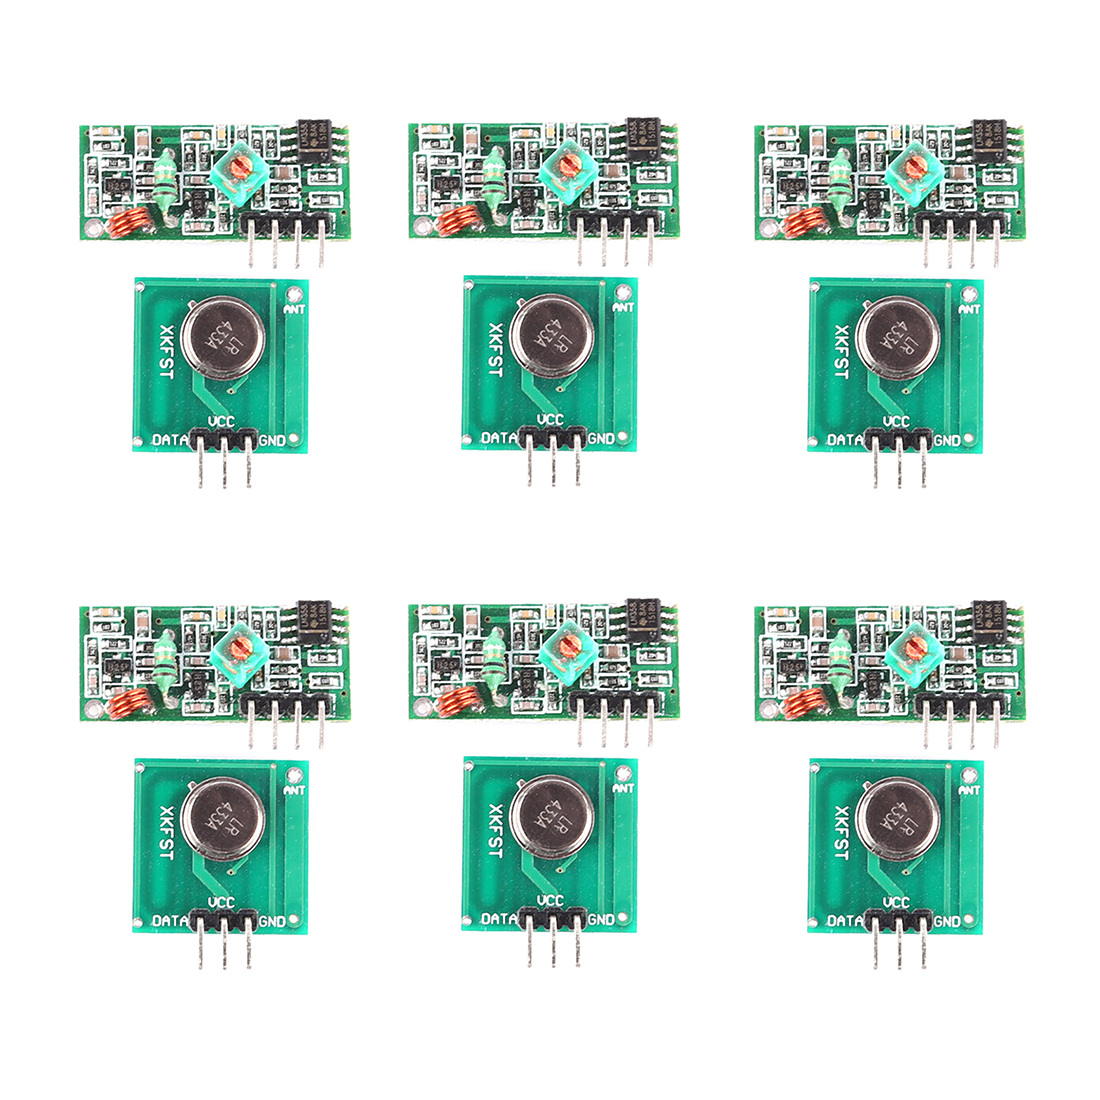 MODIKER 6PCS High Tech 433mHz Wireless Transmitter Module FOR MCU Decoding Receiver For Arduino ARM MCU Wireless Programmable